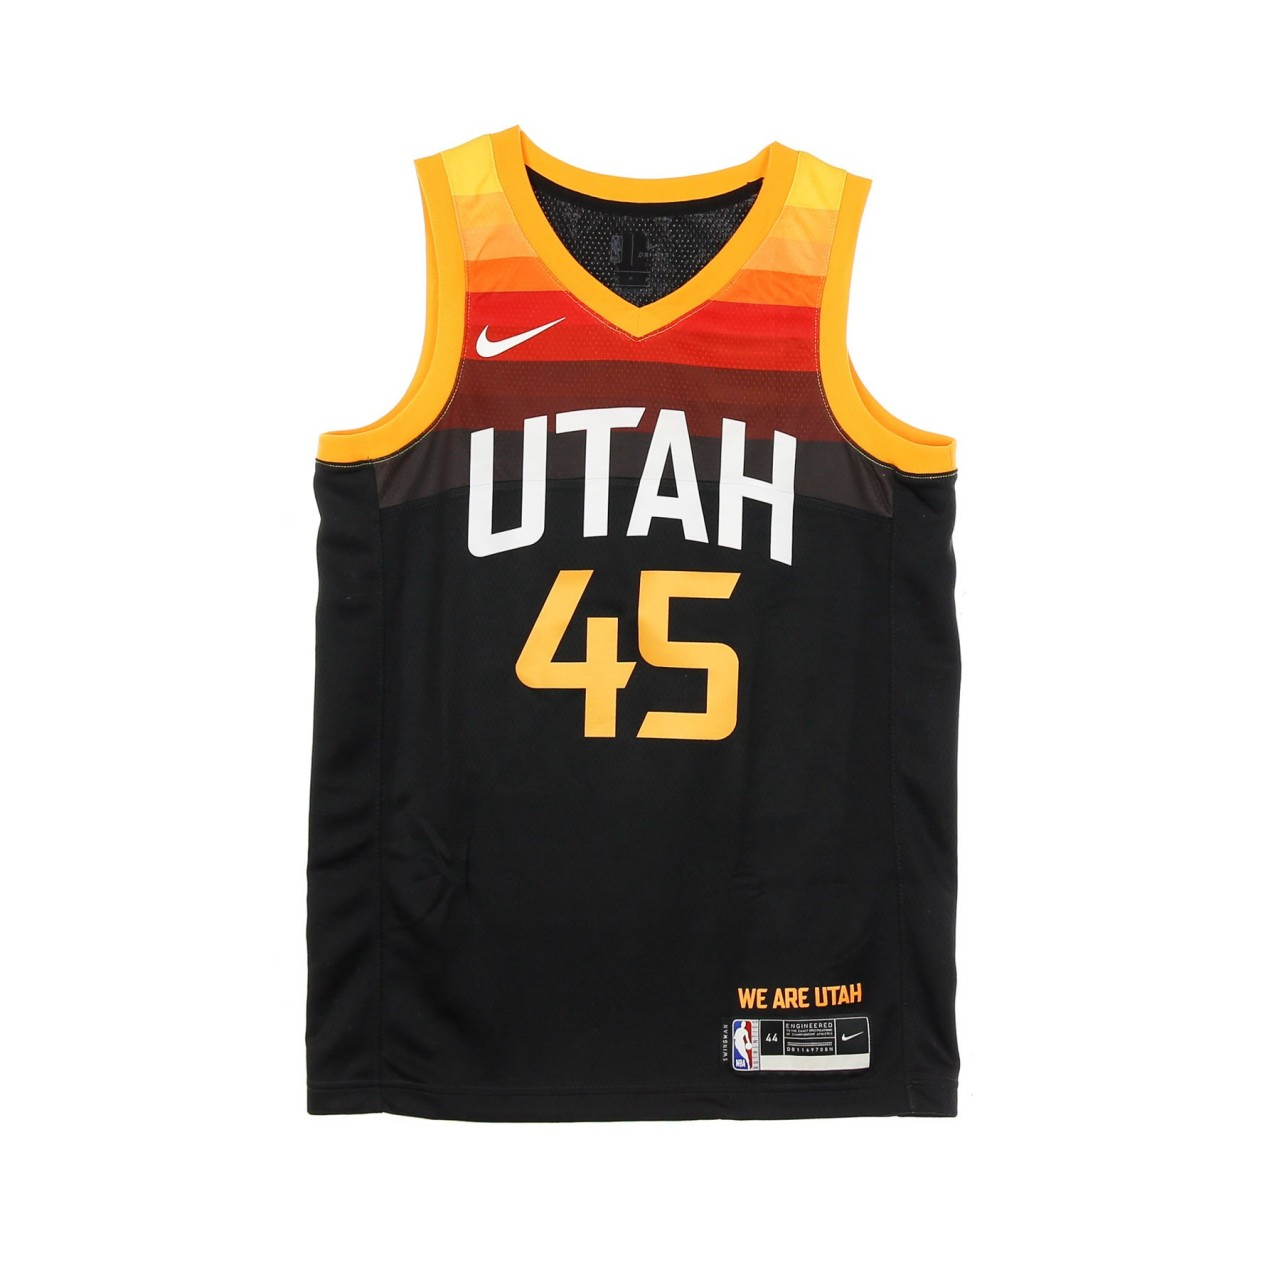 NIKE NBA NBA SWINGMAN JERSEY CITY EDITION 2020 NO 45 DONOVAN MITCHELL UTAJAZ CN1800-011